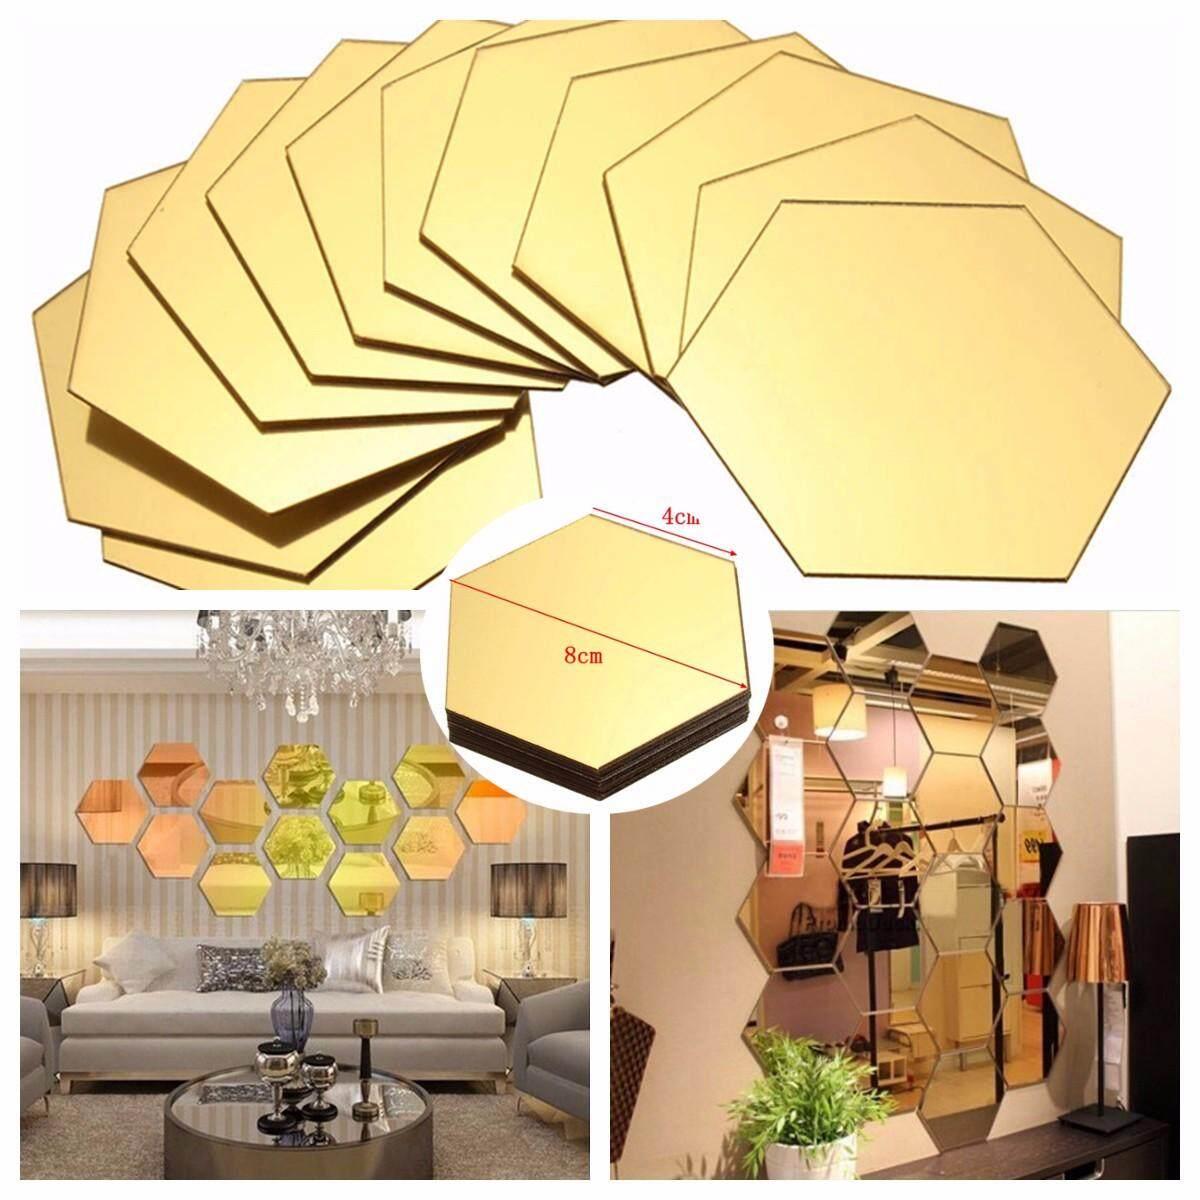 【Flash Deal】120pcs 3D Mirror Hexagon Vinyl Removable Wall Sticker Decal Home Decor Art DIY